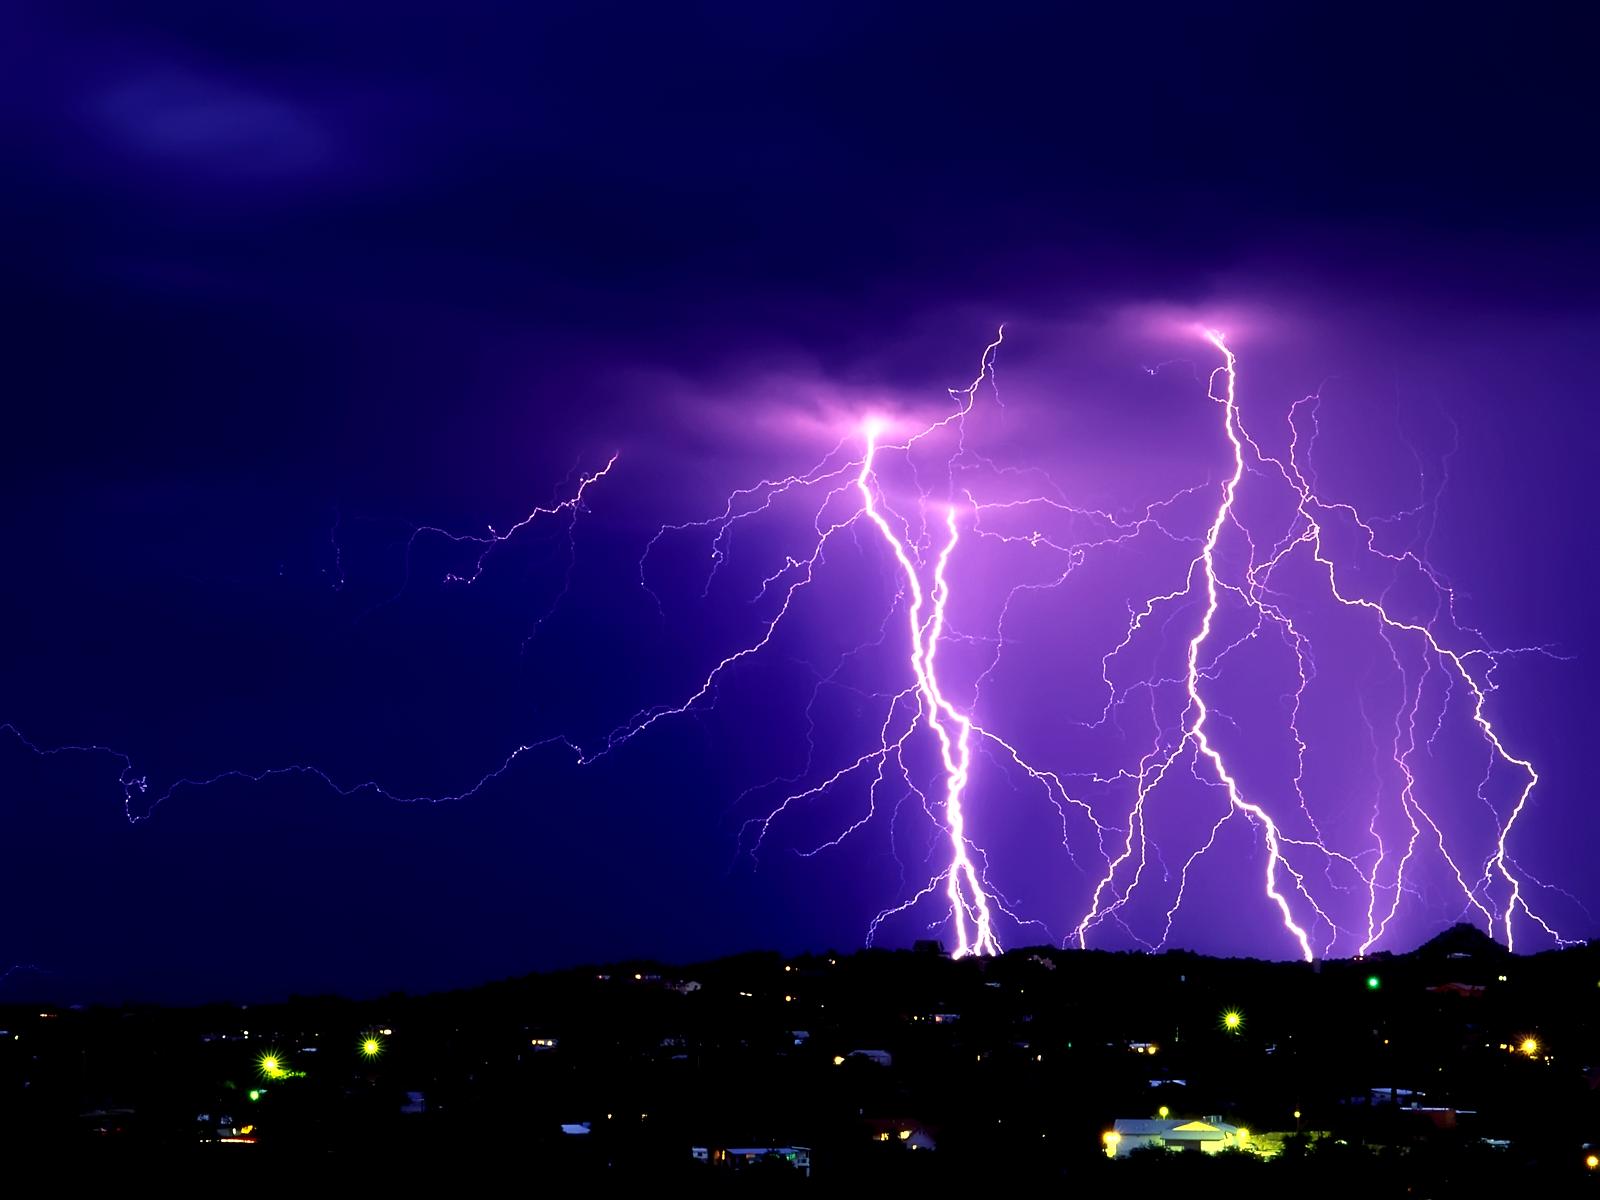 Lightning Storm Wallpaper Free Download